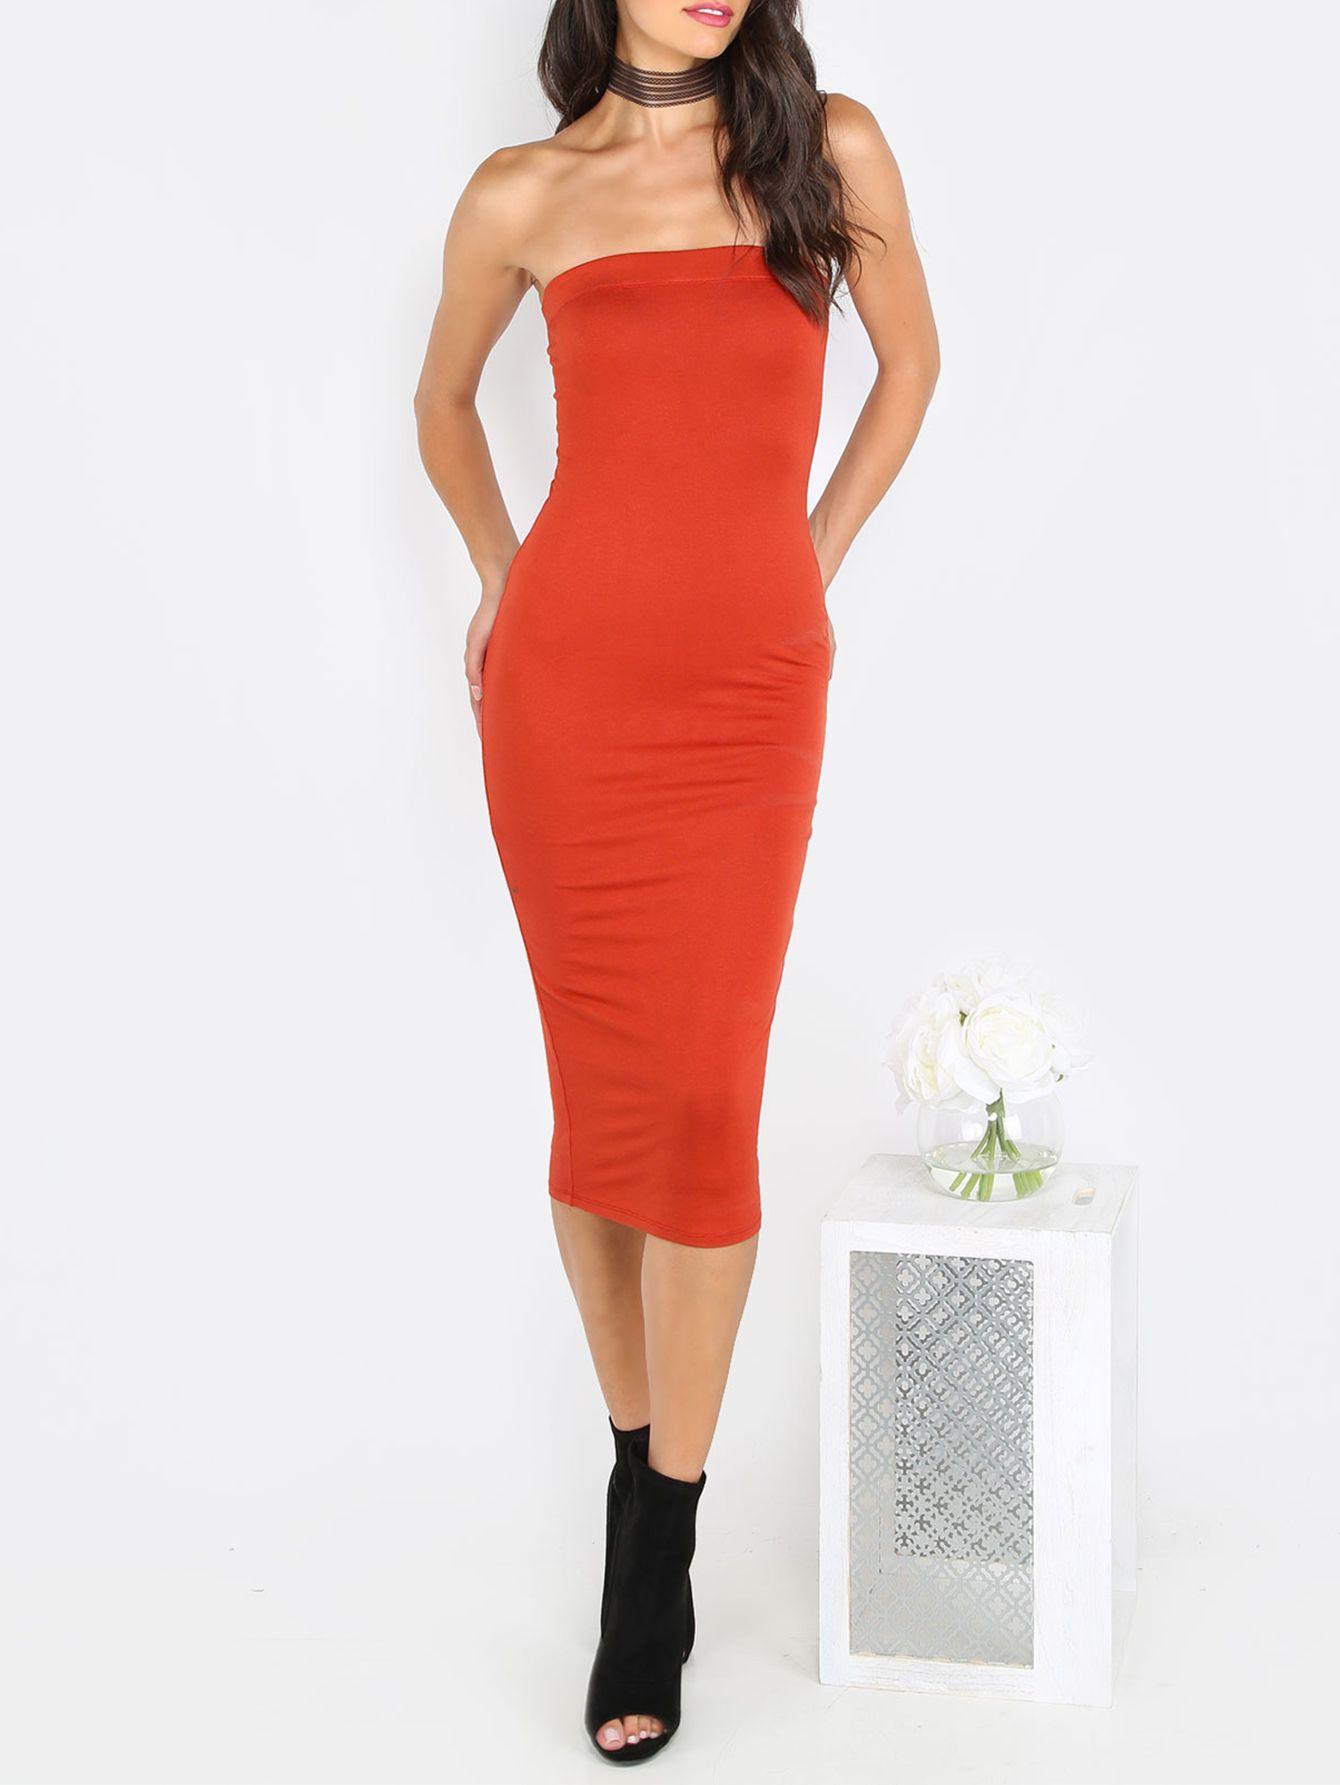 cfb3ff658c Rust Red Tube Sleeveless Sheath Midi Dress -Red Elegant Rayon Strapless  Sleeveless Sheath Midi Plain